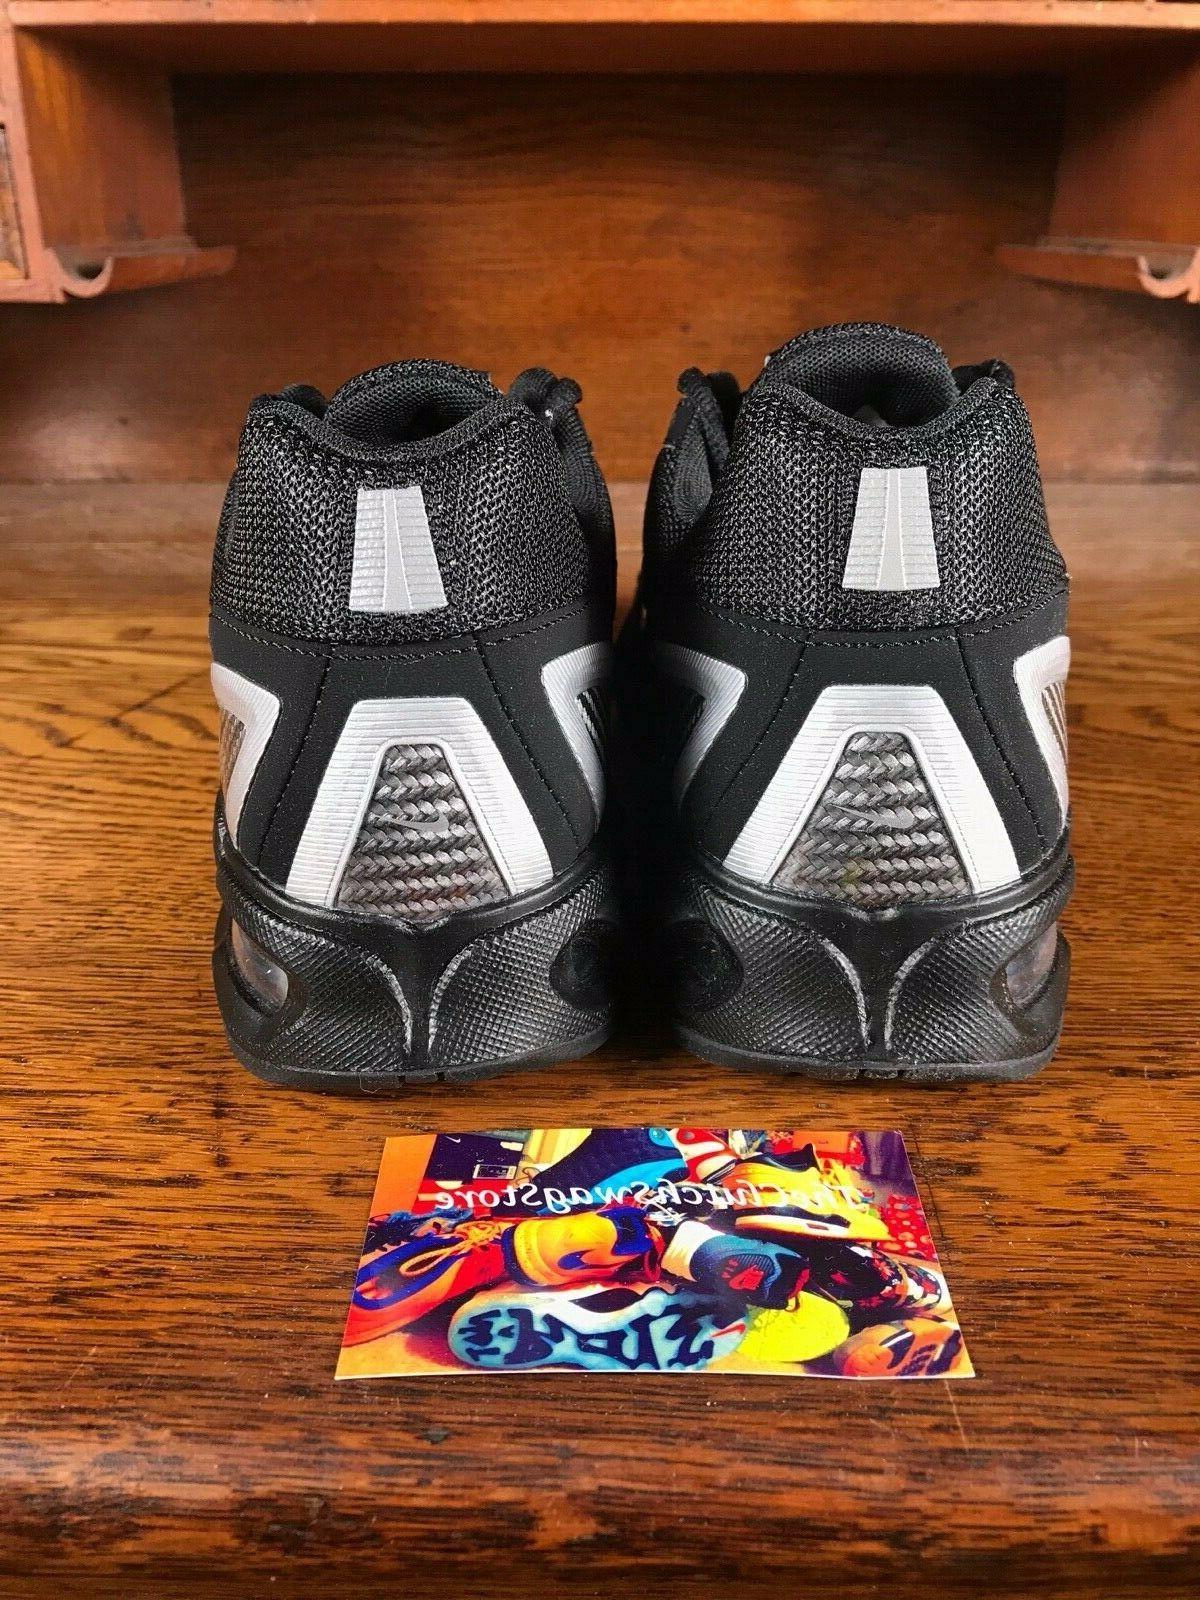 Nike Air Torch 3 Black/White 319116-011 Sizes